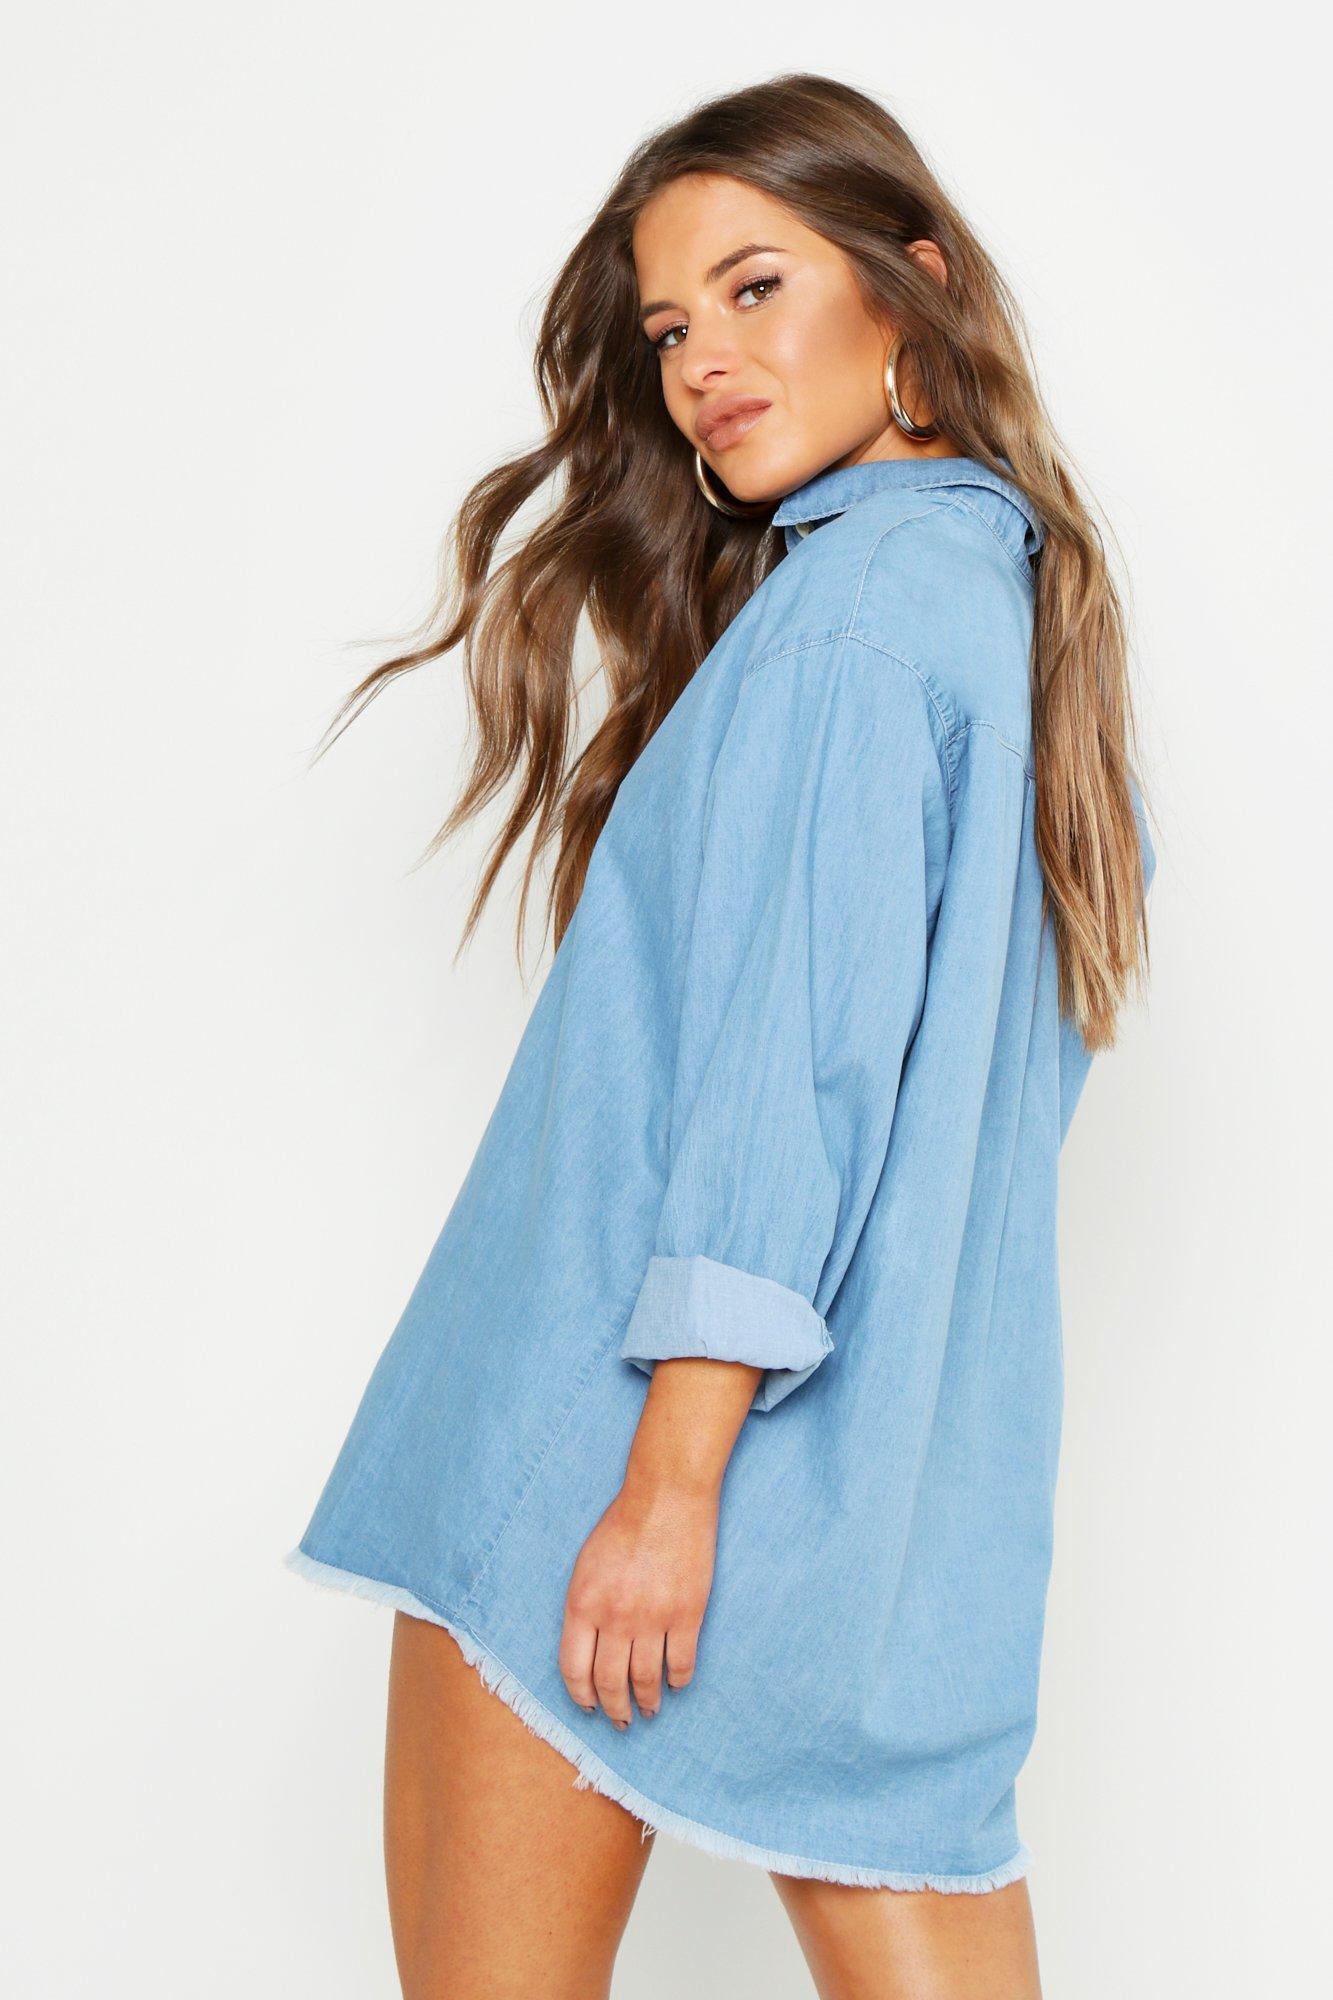 846abadc418 Boohoo - Blue Petite Denim Oversized Shirt Dress - Lyst. View fullscreen